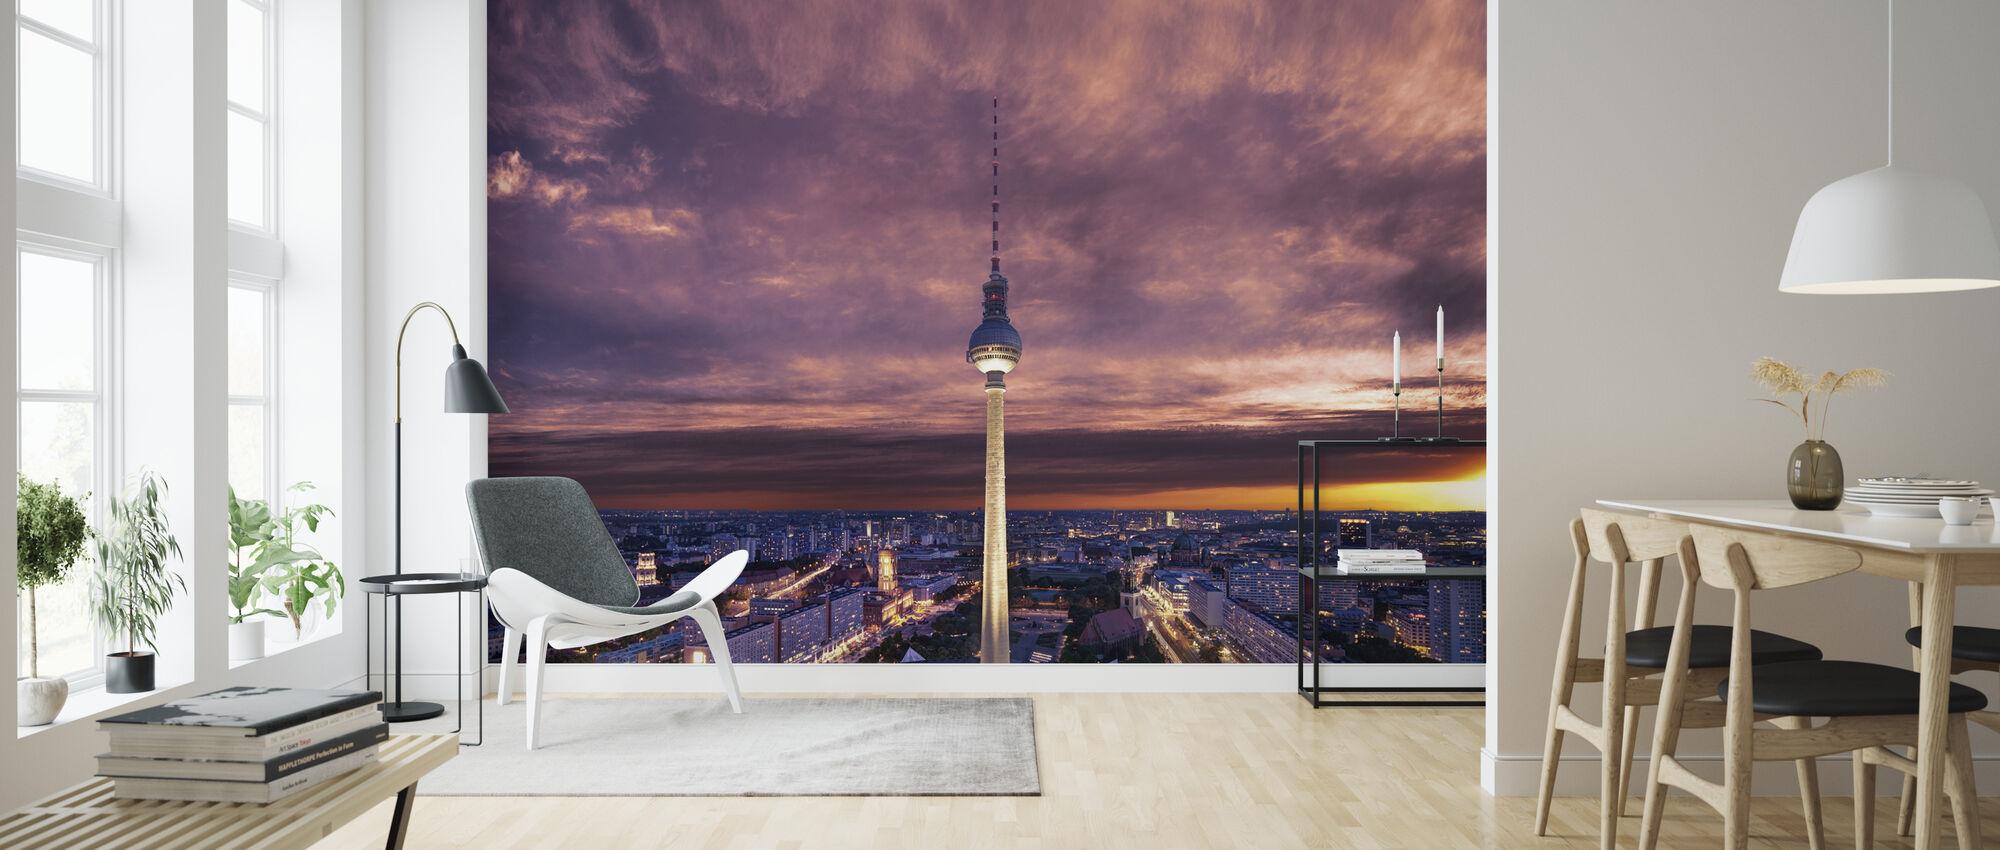 Tv-tower against Dramatic Sky - Wallpaper - Living Room